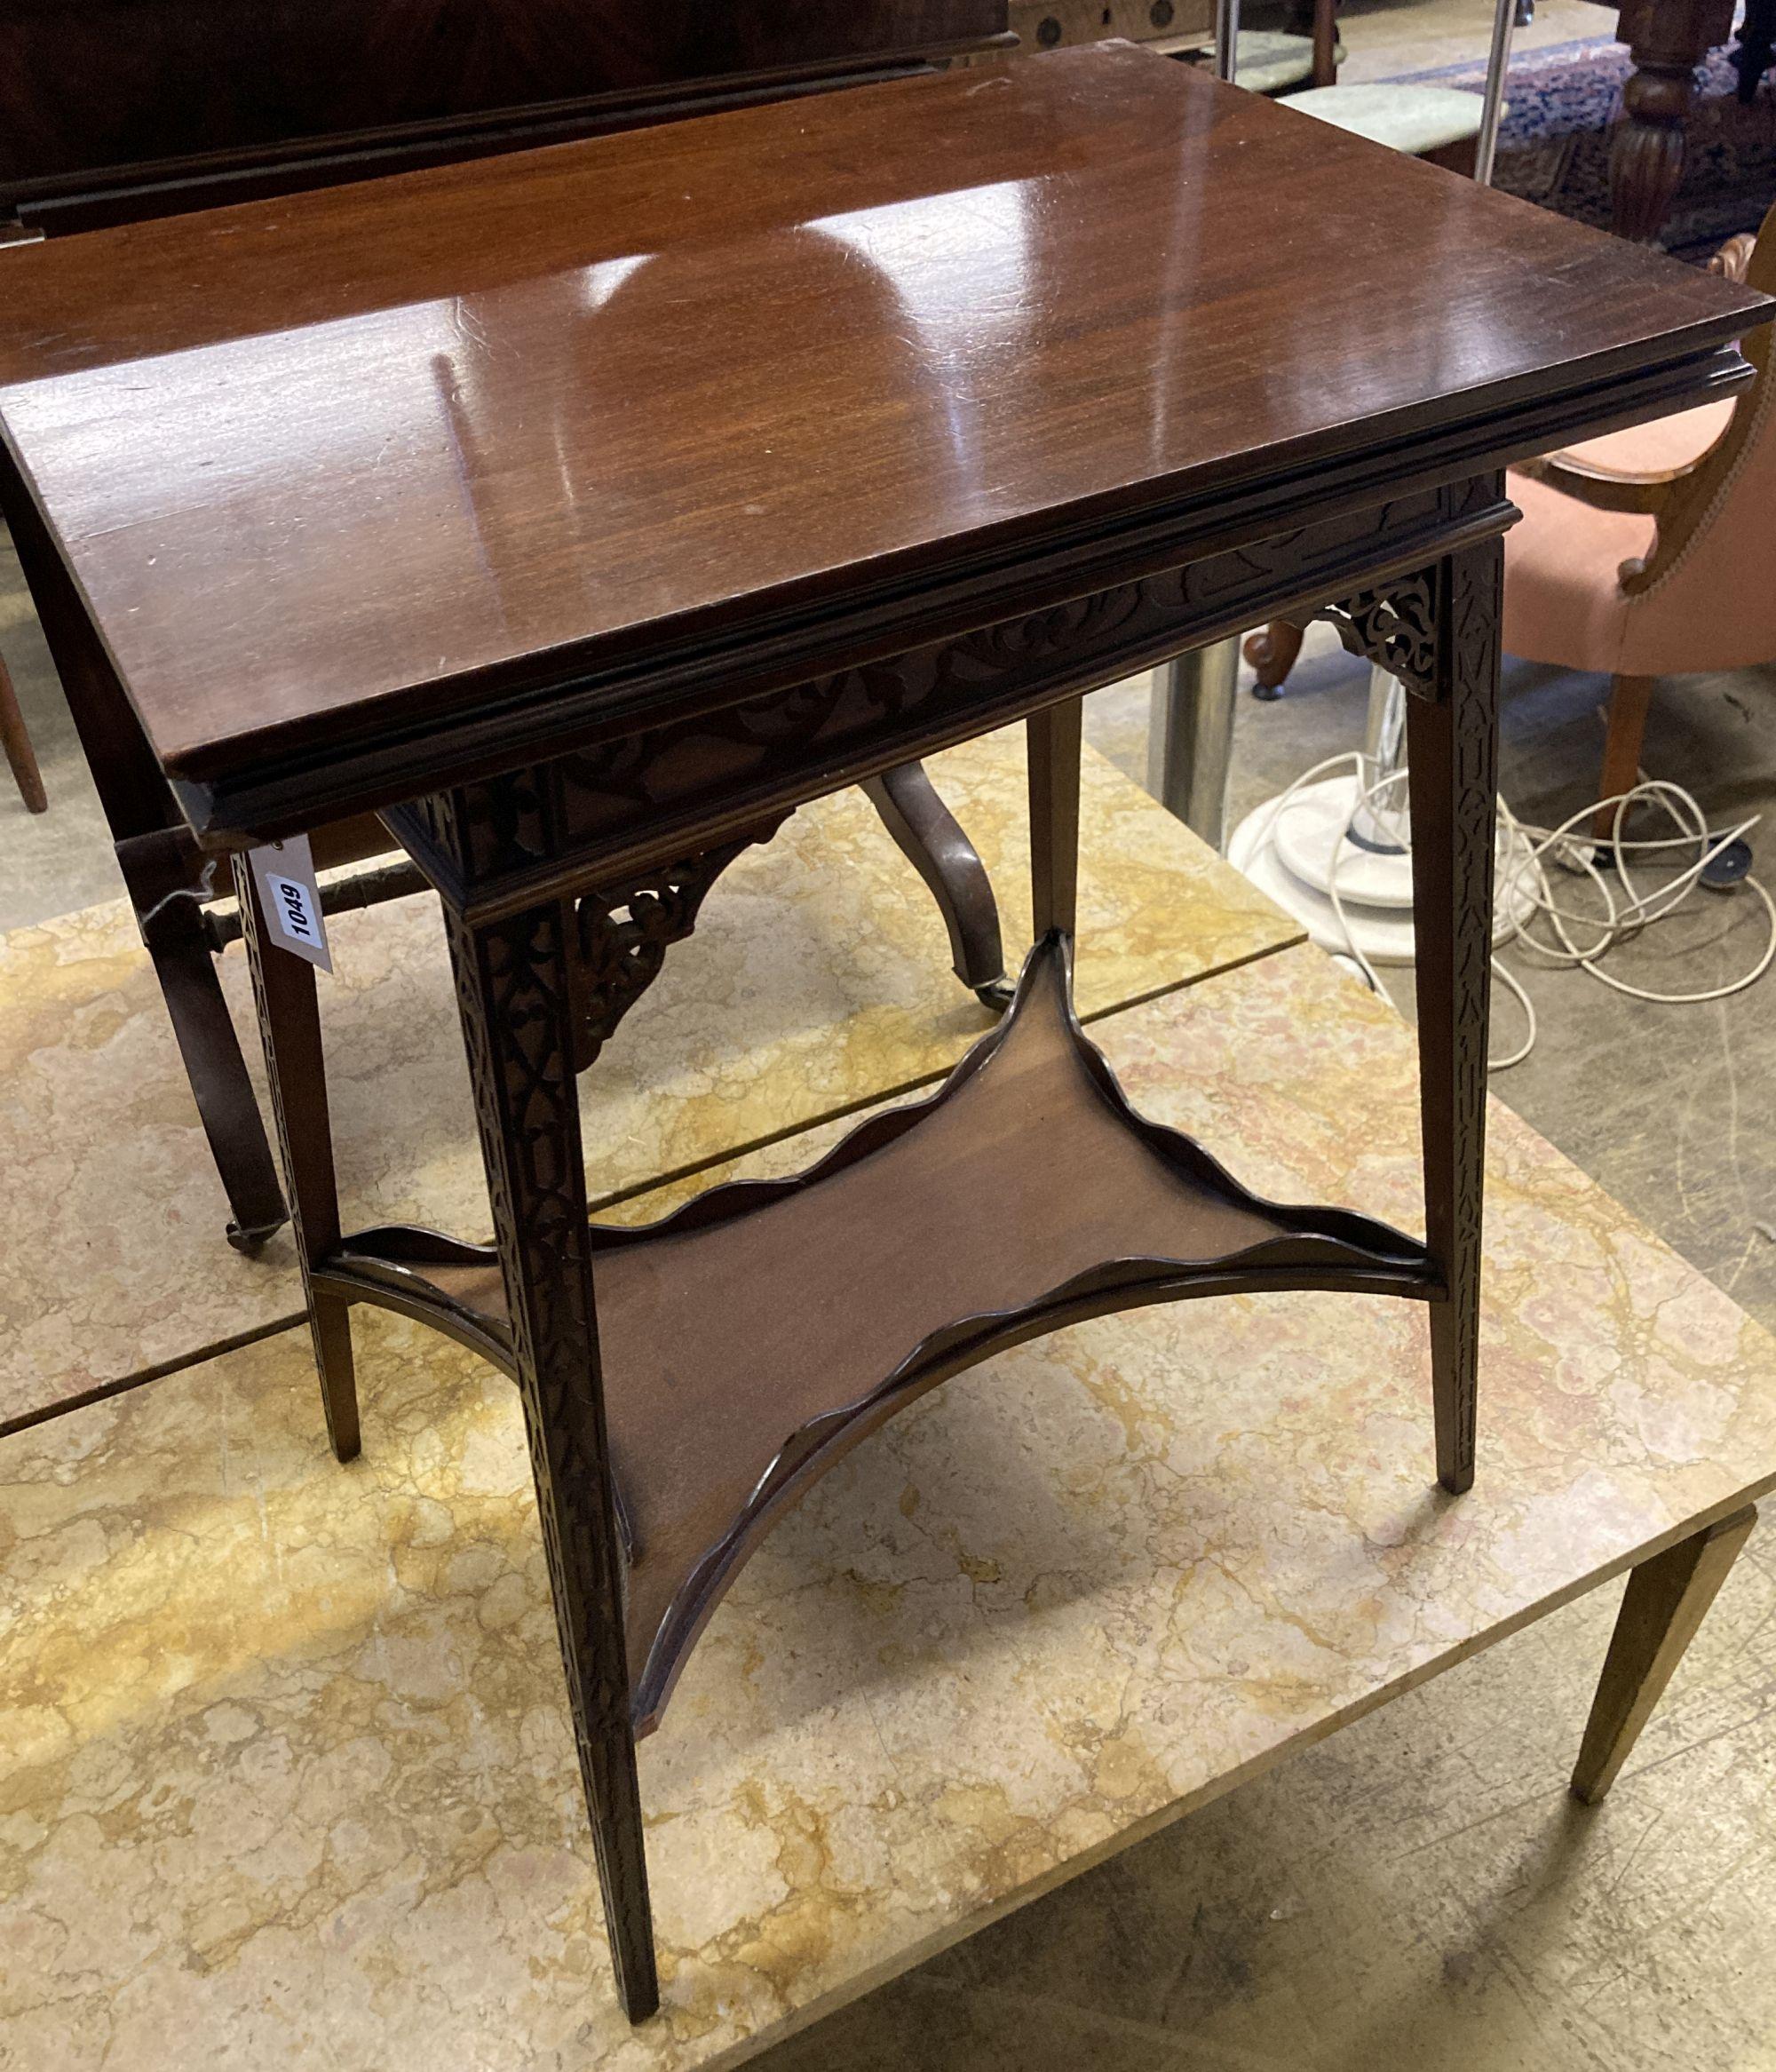 A late Victorian mahogany blind fret folding tea table, width 50cm, depth 38cm, height 65cm